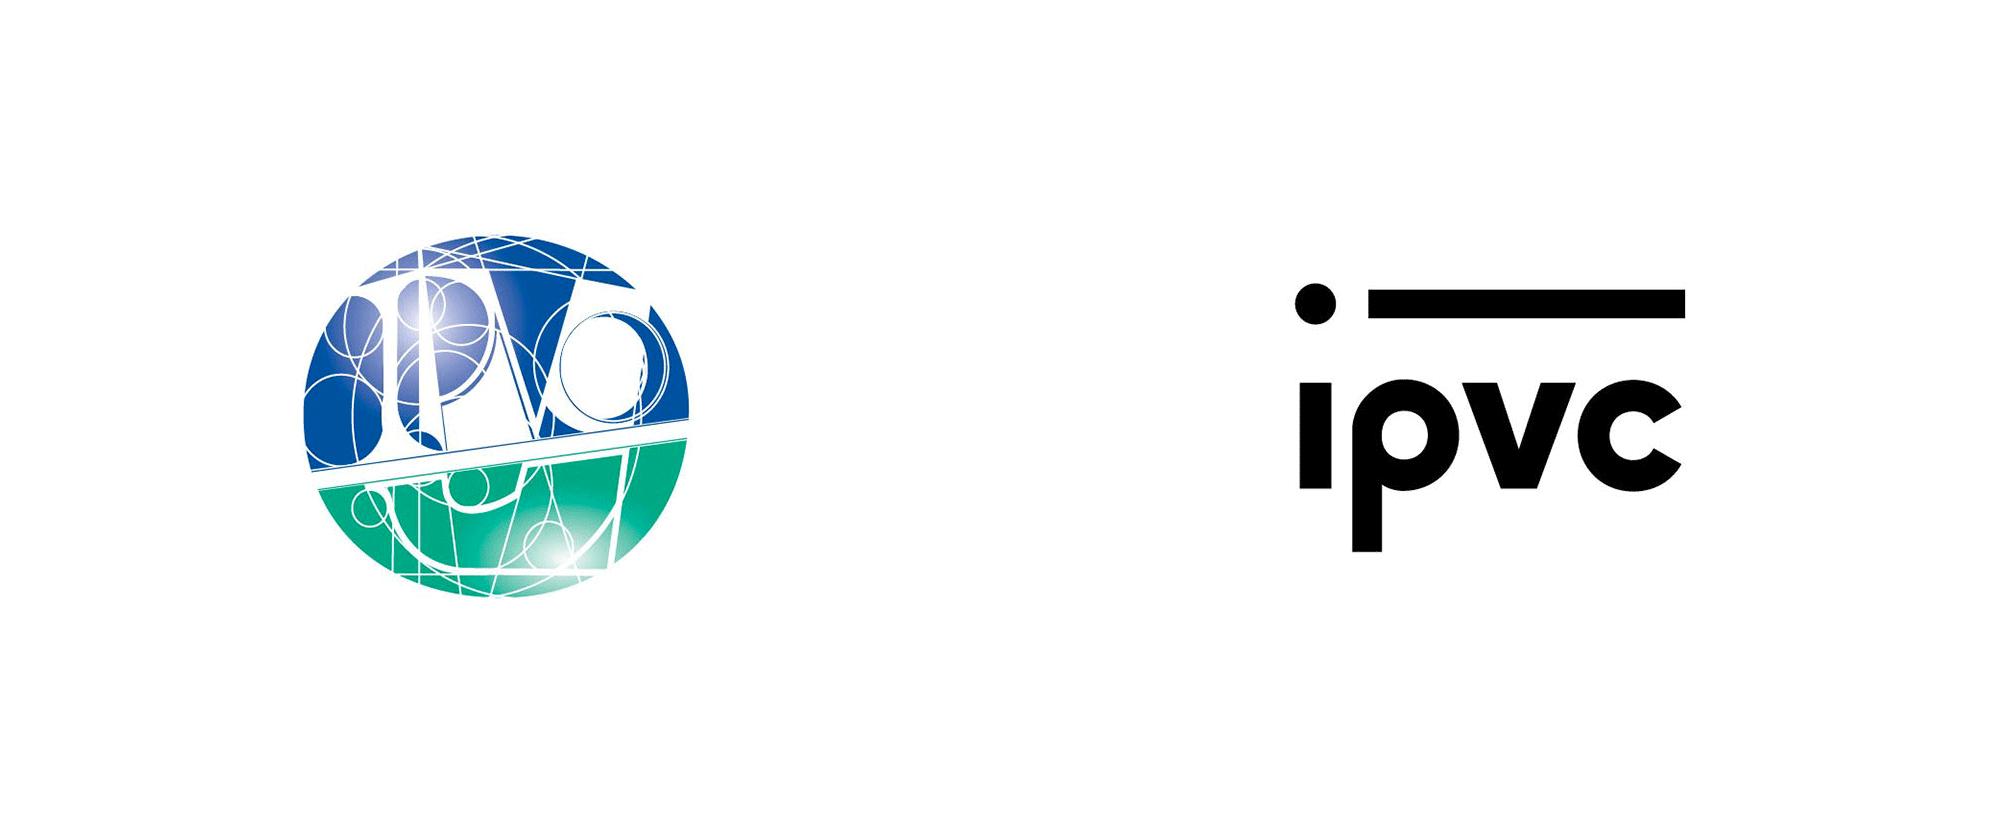 New Logo and Identity for IPVC by Helena Soares and Sara Costa